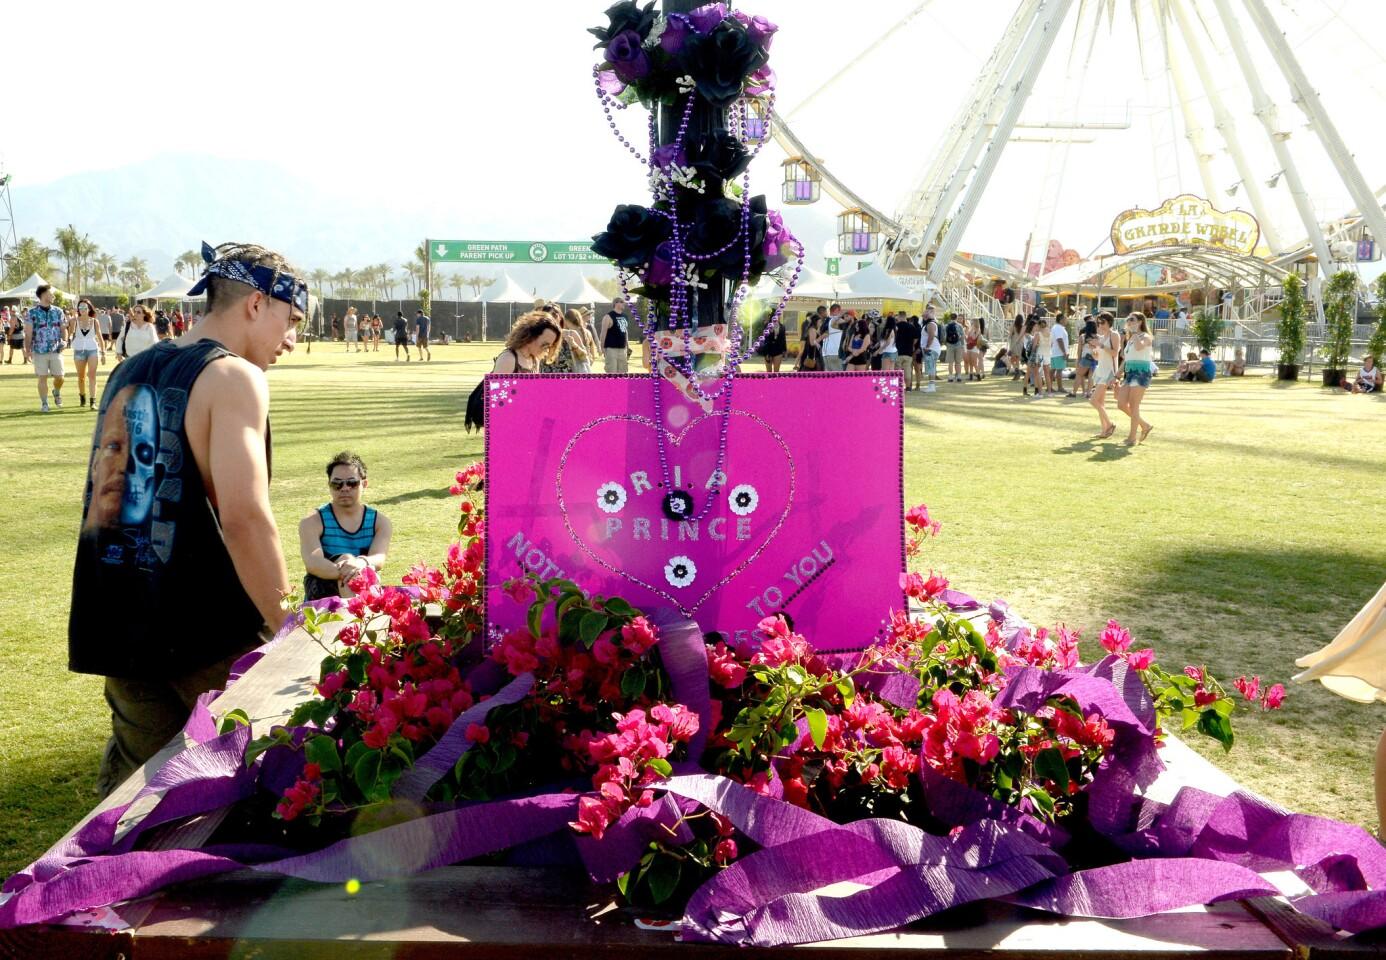 Remembering Prince at Coachella